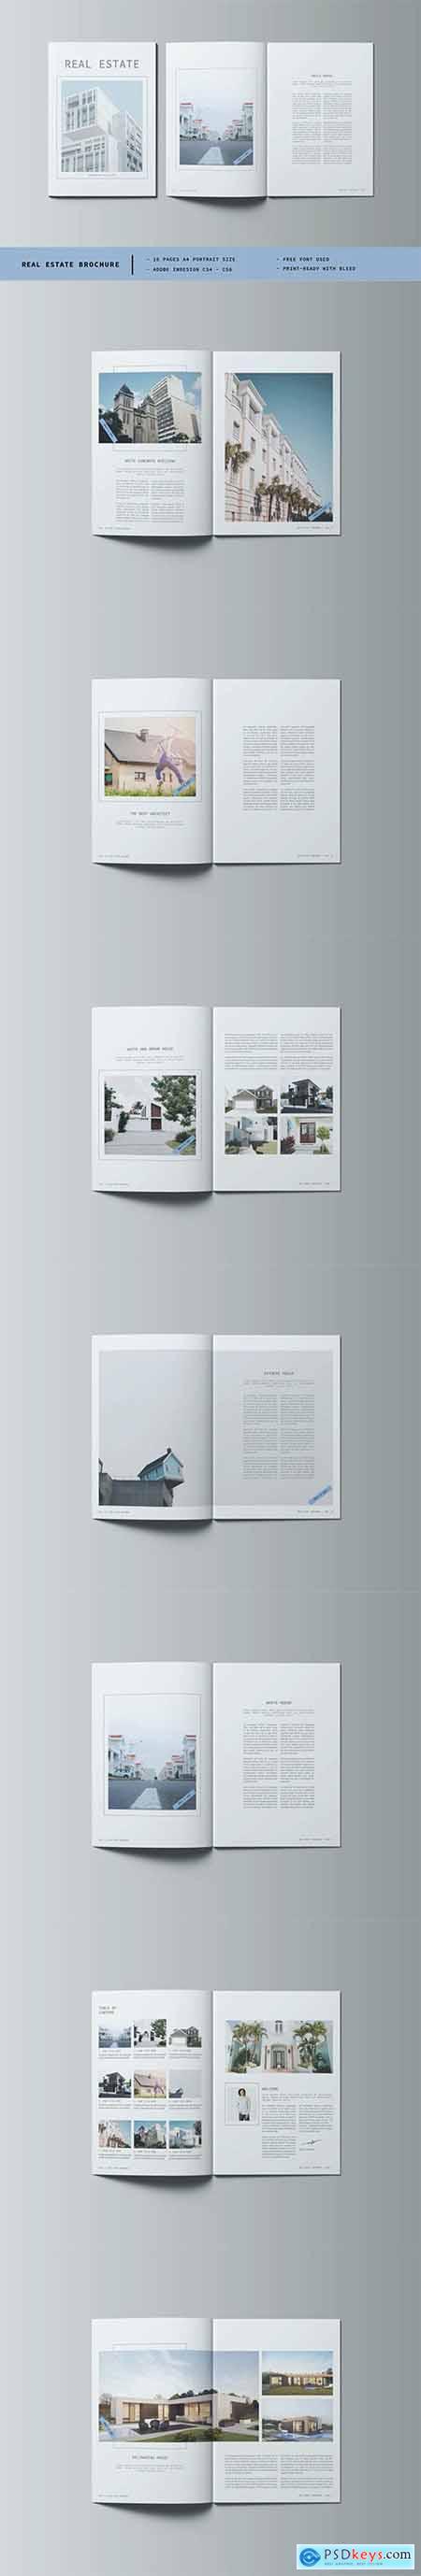 Real Estate Catalogue - Brochure